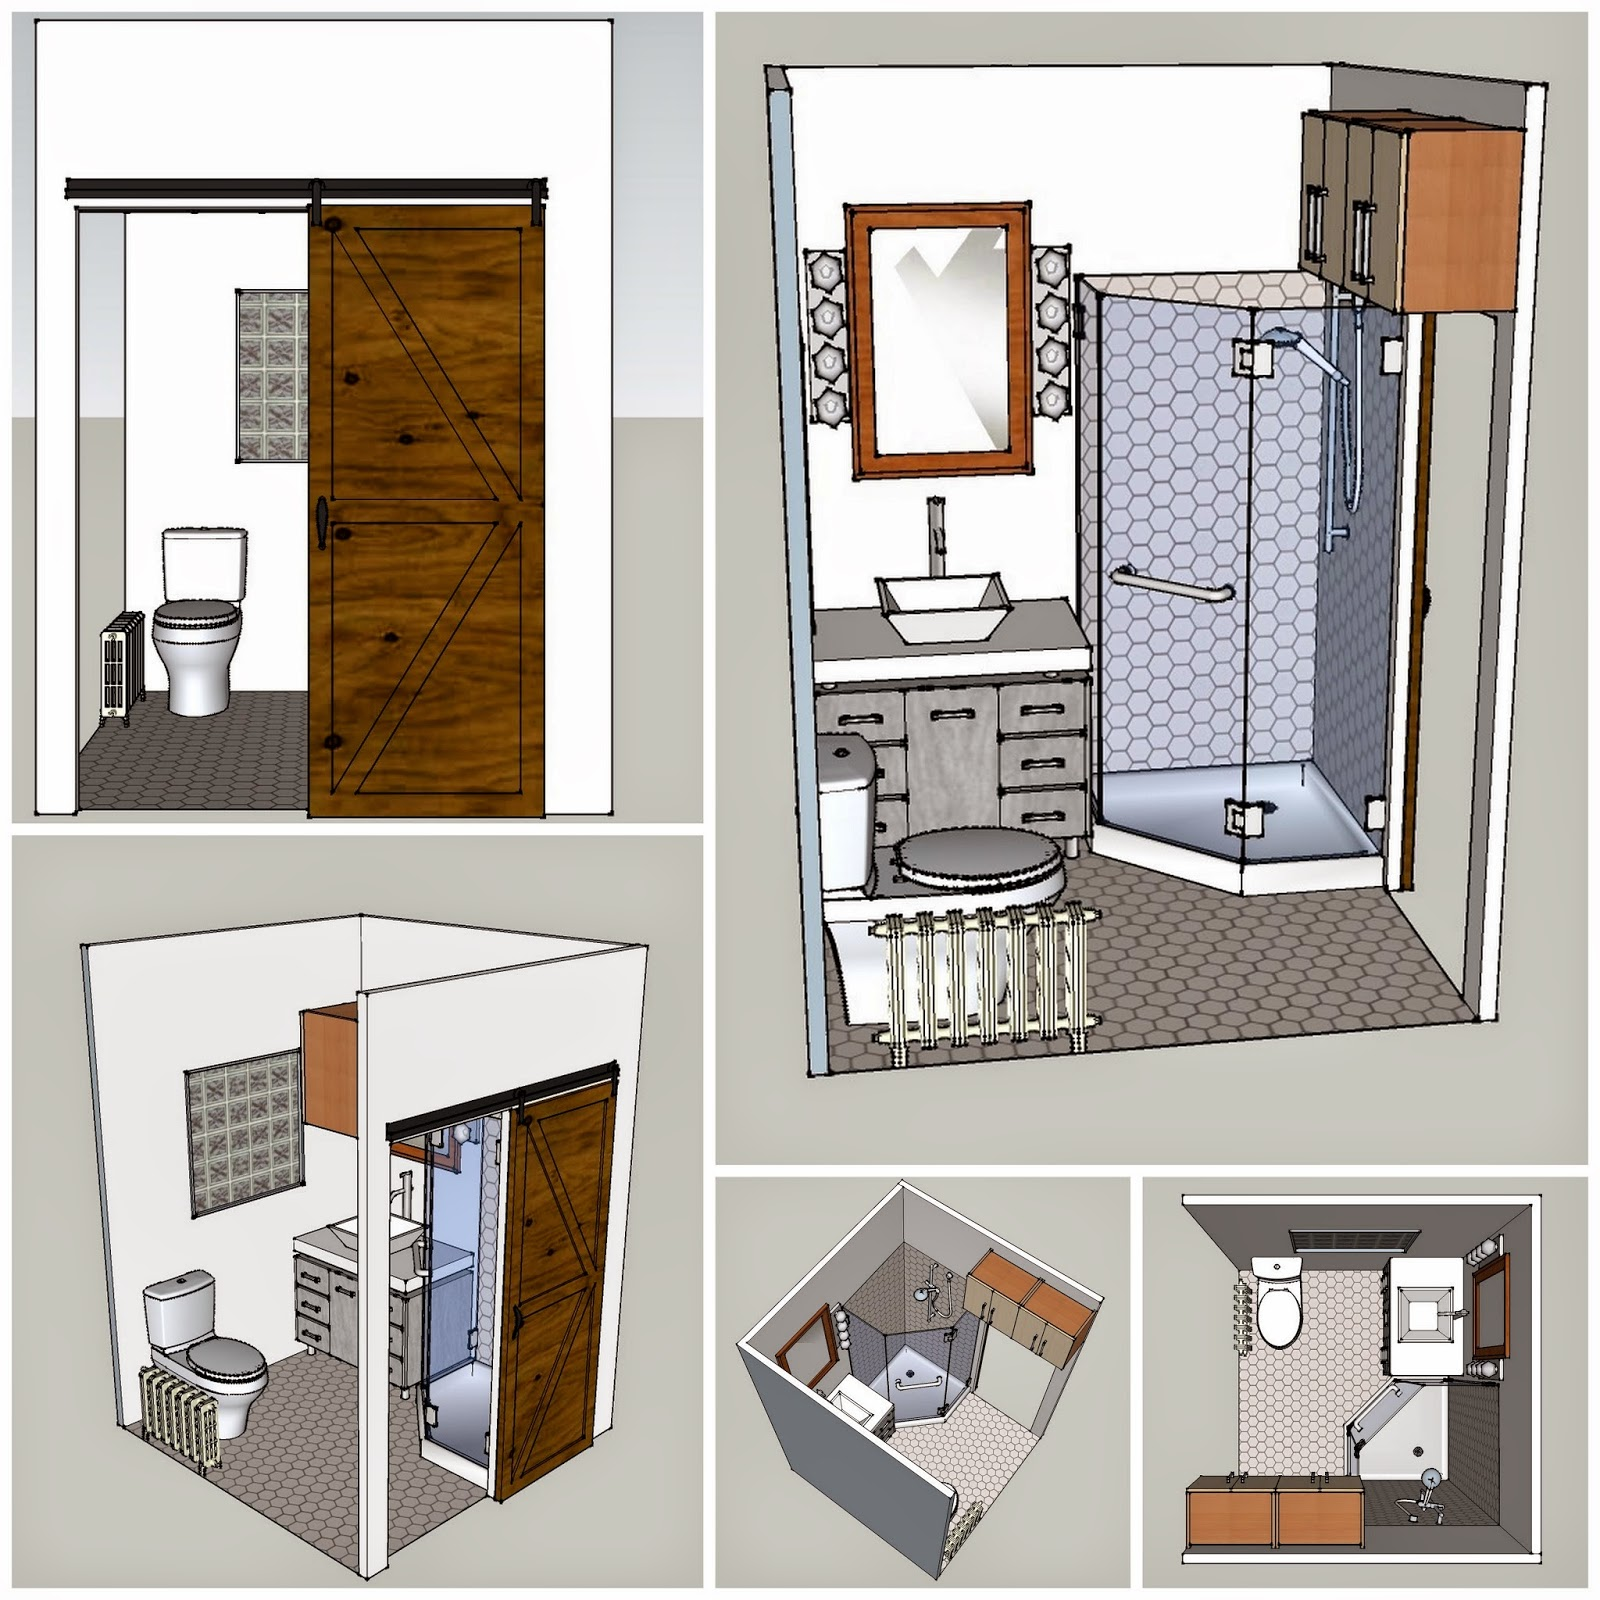 Haphazard musings and creations learning google sketchup for Sketchup bathroom sink